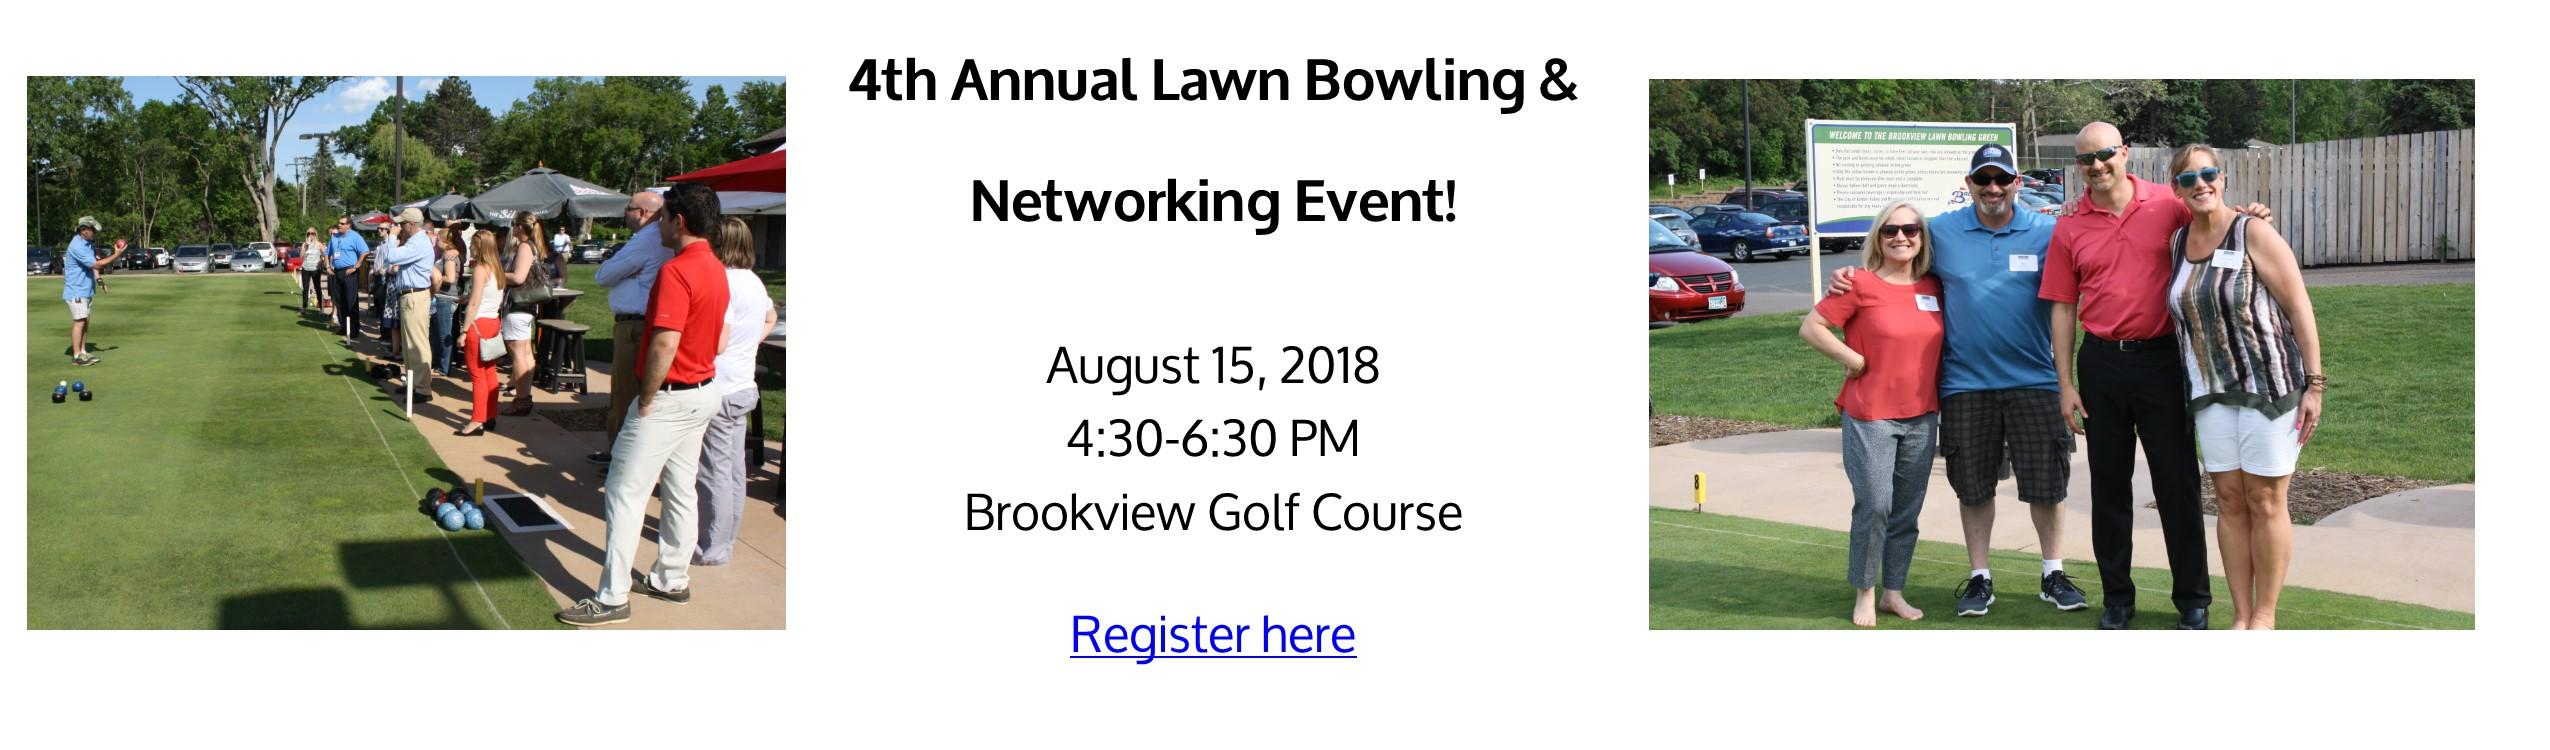 Lawn-Bowling.2018(1).jpg